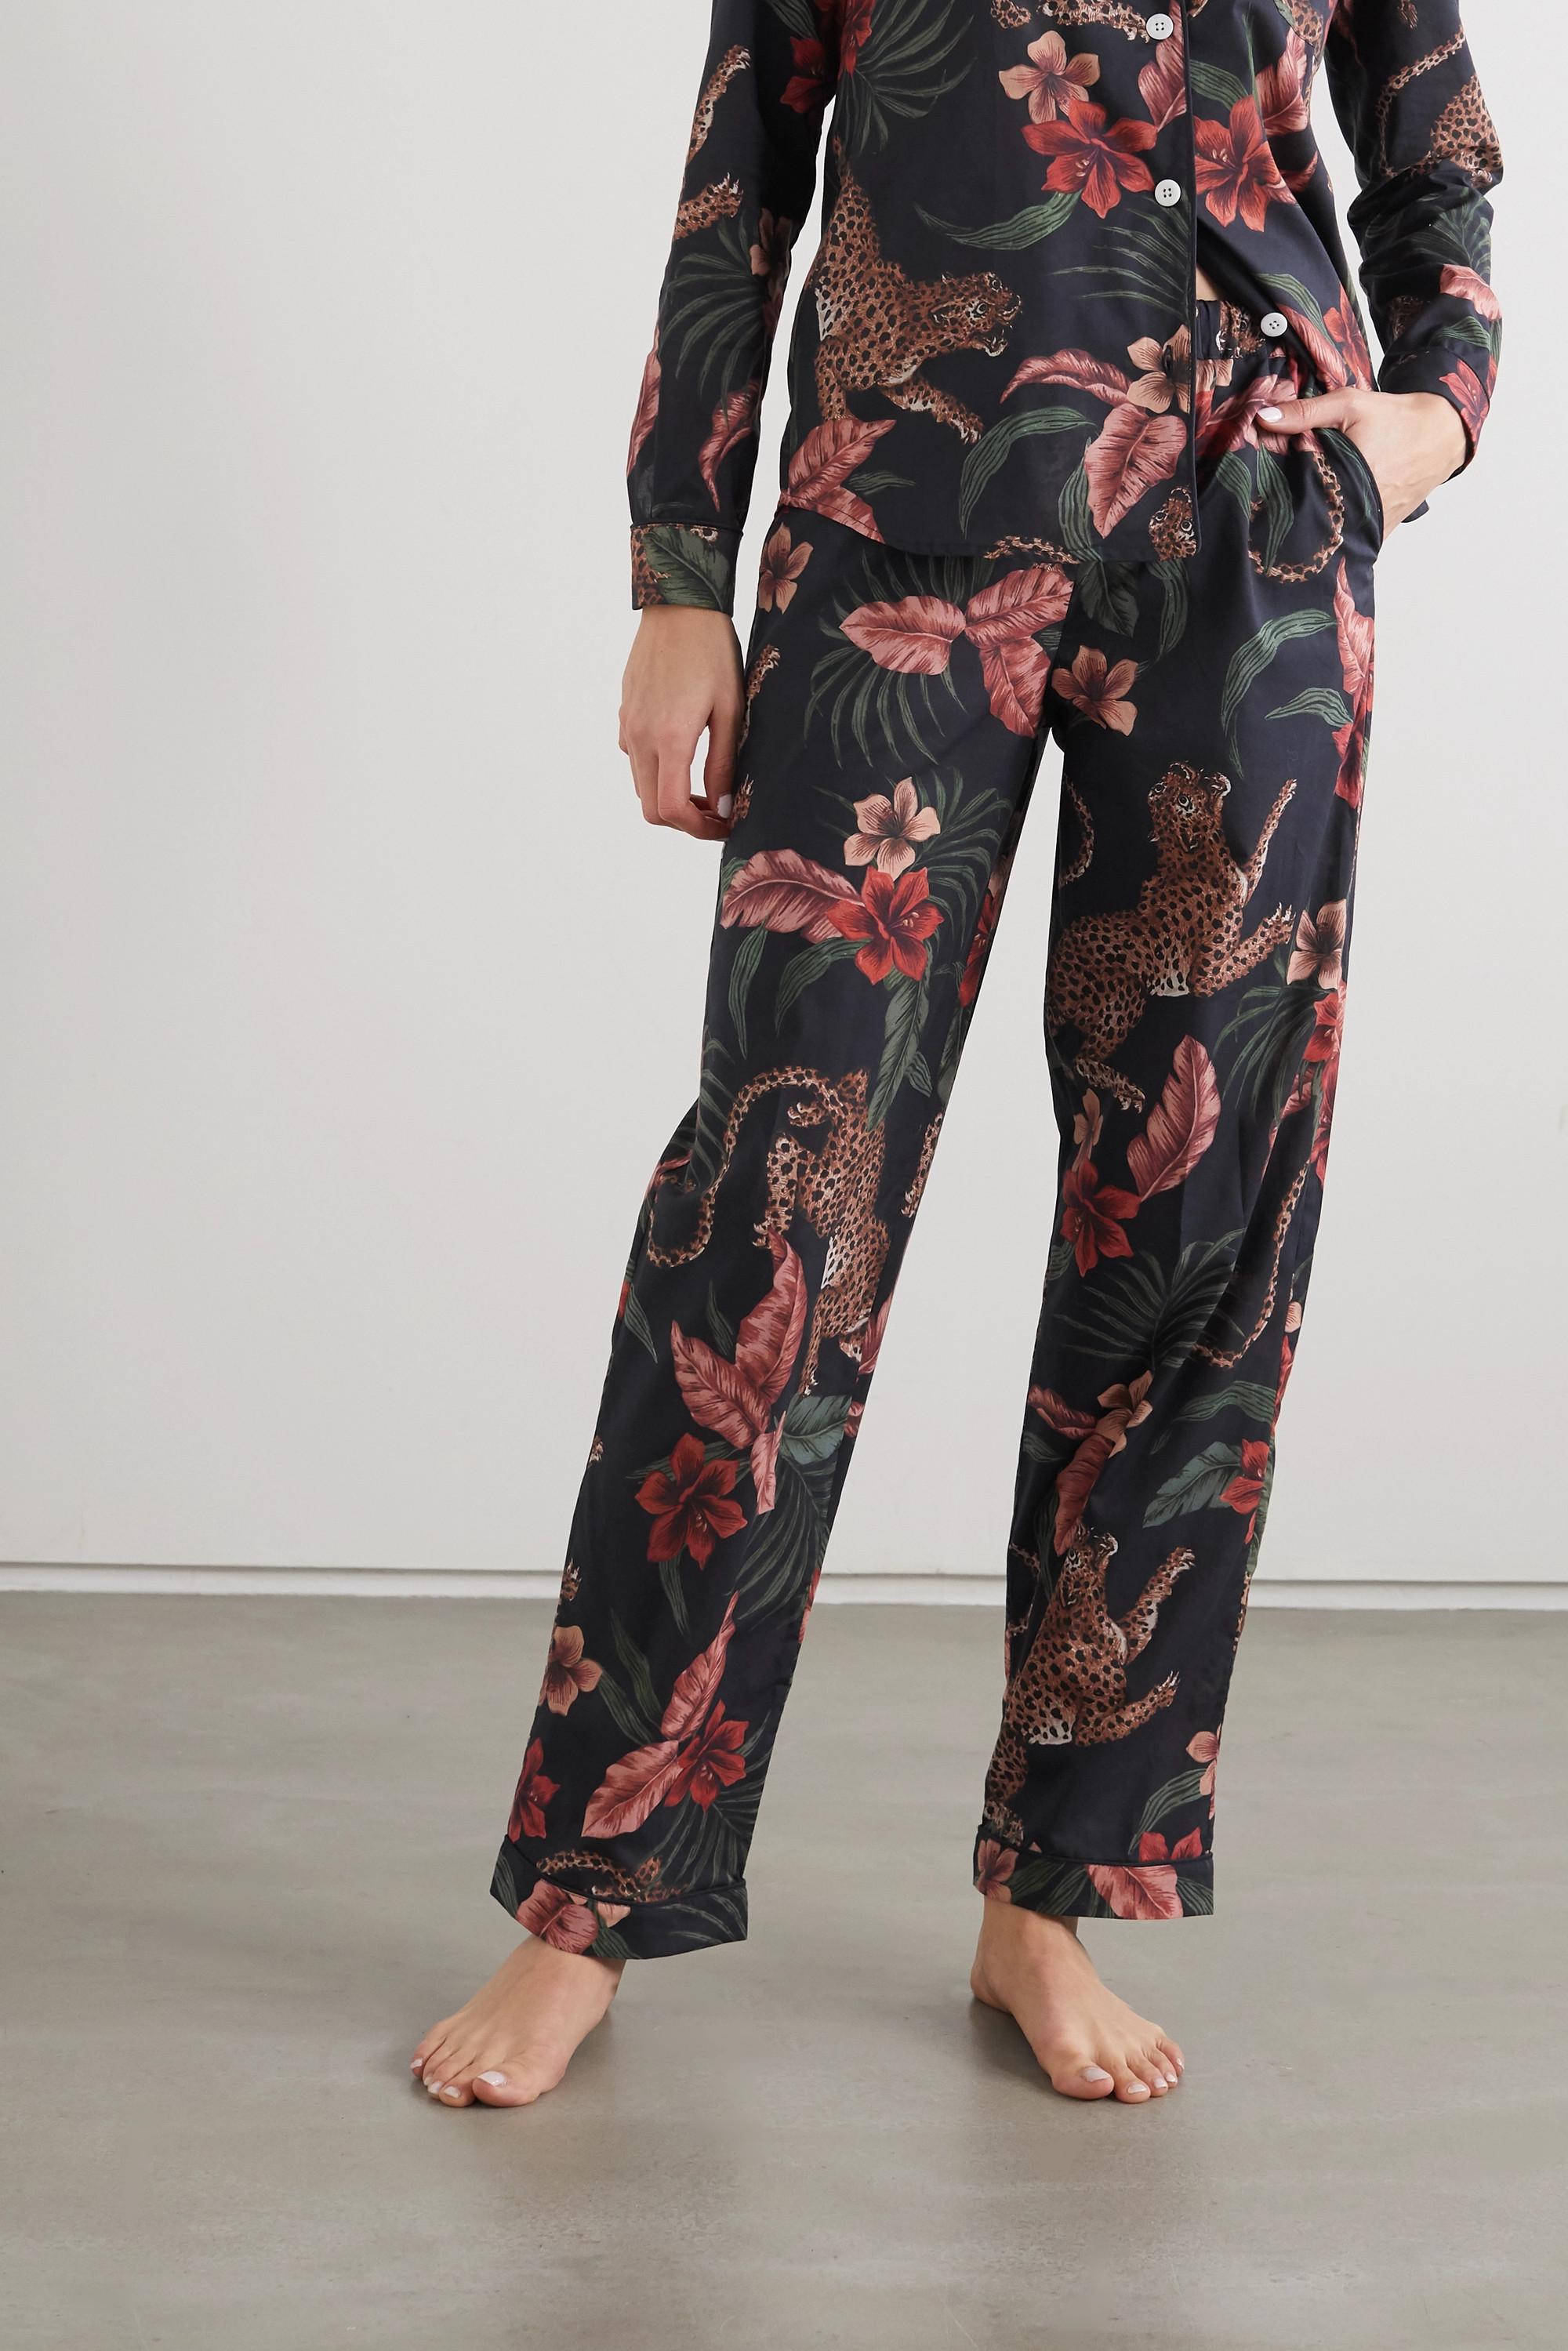 Desmond & Dempsey Printed organic cotton pajama set